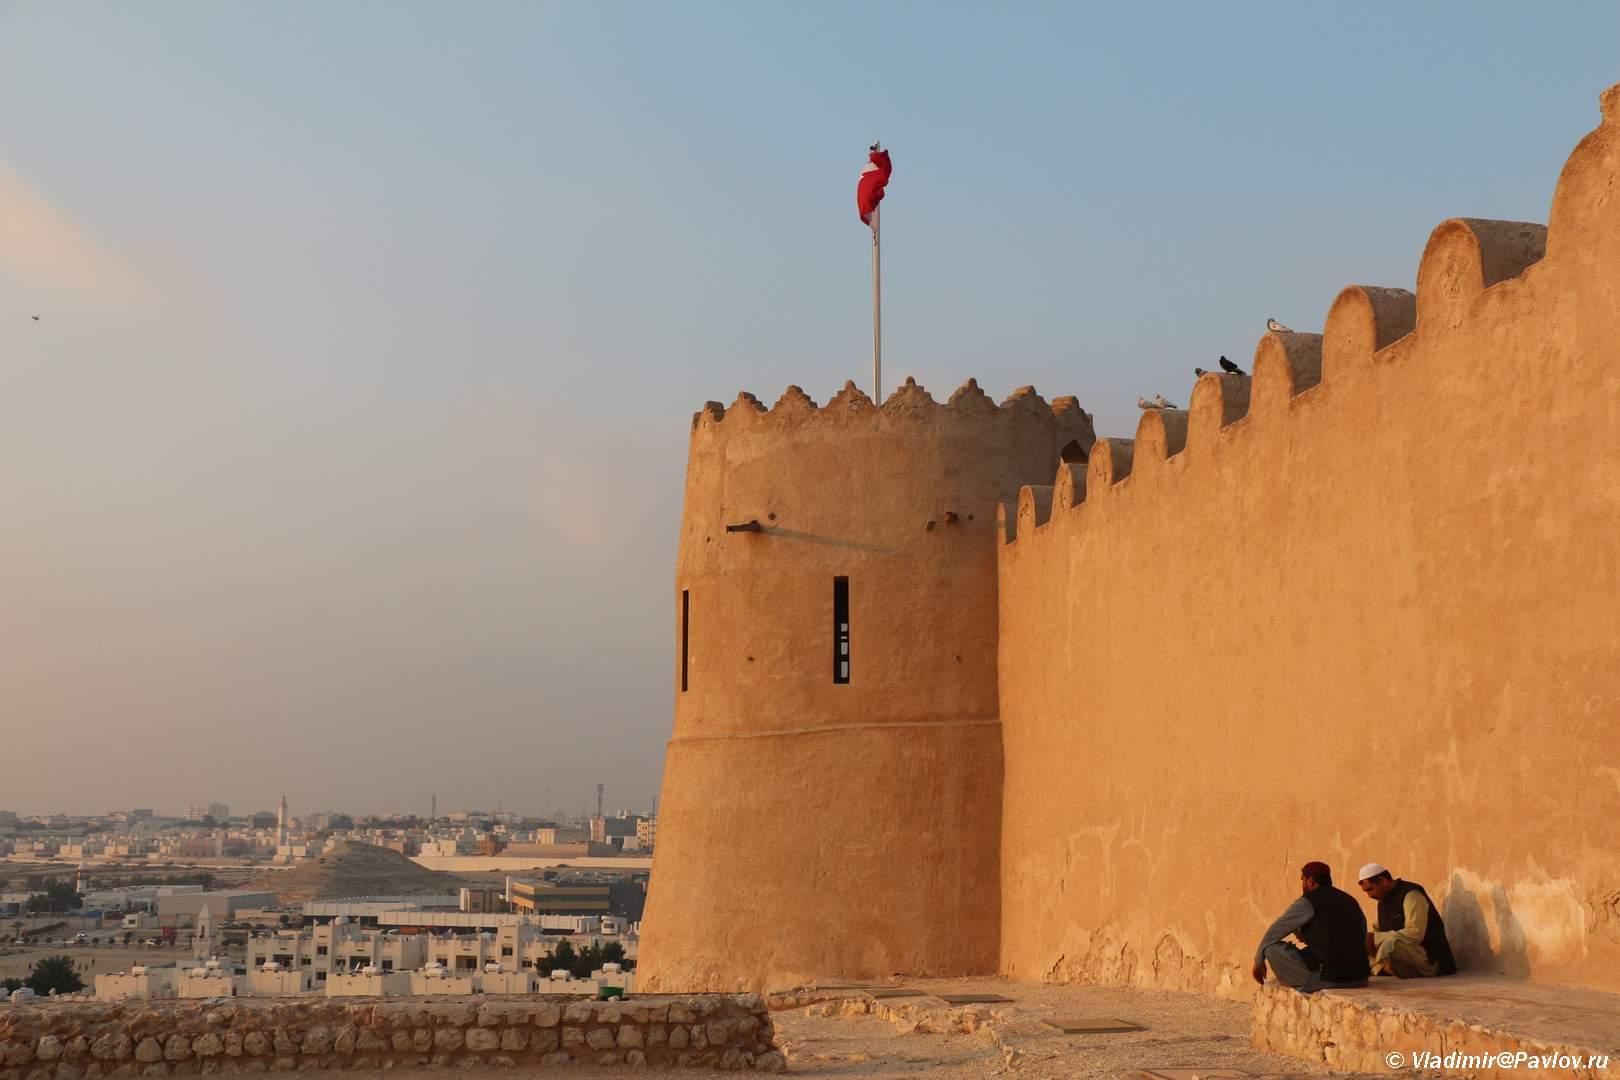 Bahrejntsy otdyhayut u Forta Salman bin Ahmet al Fateh v Er Rifa. Bahrejn. Sheikh Salman Bin Ahmed Al Fateh Fort Riffa - Достопримечательности Бахрейна. Что посмотреть в Бахрейне